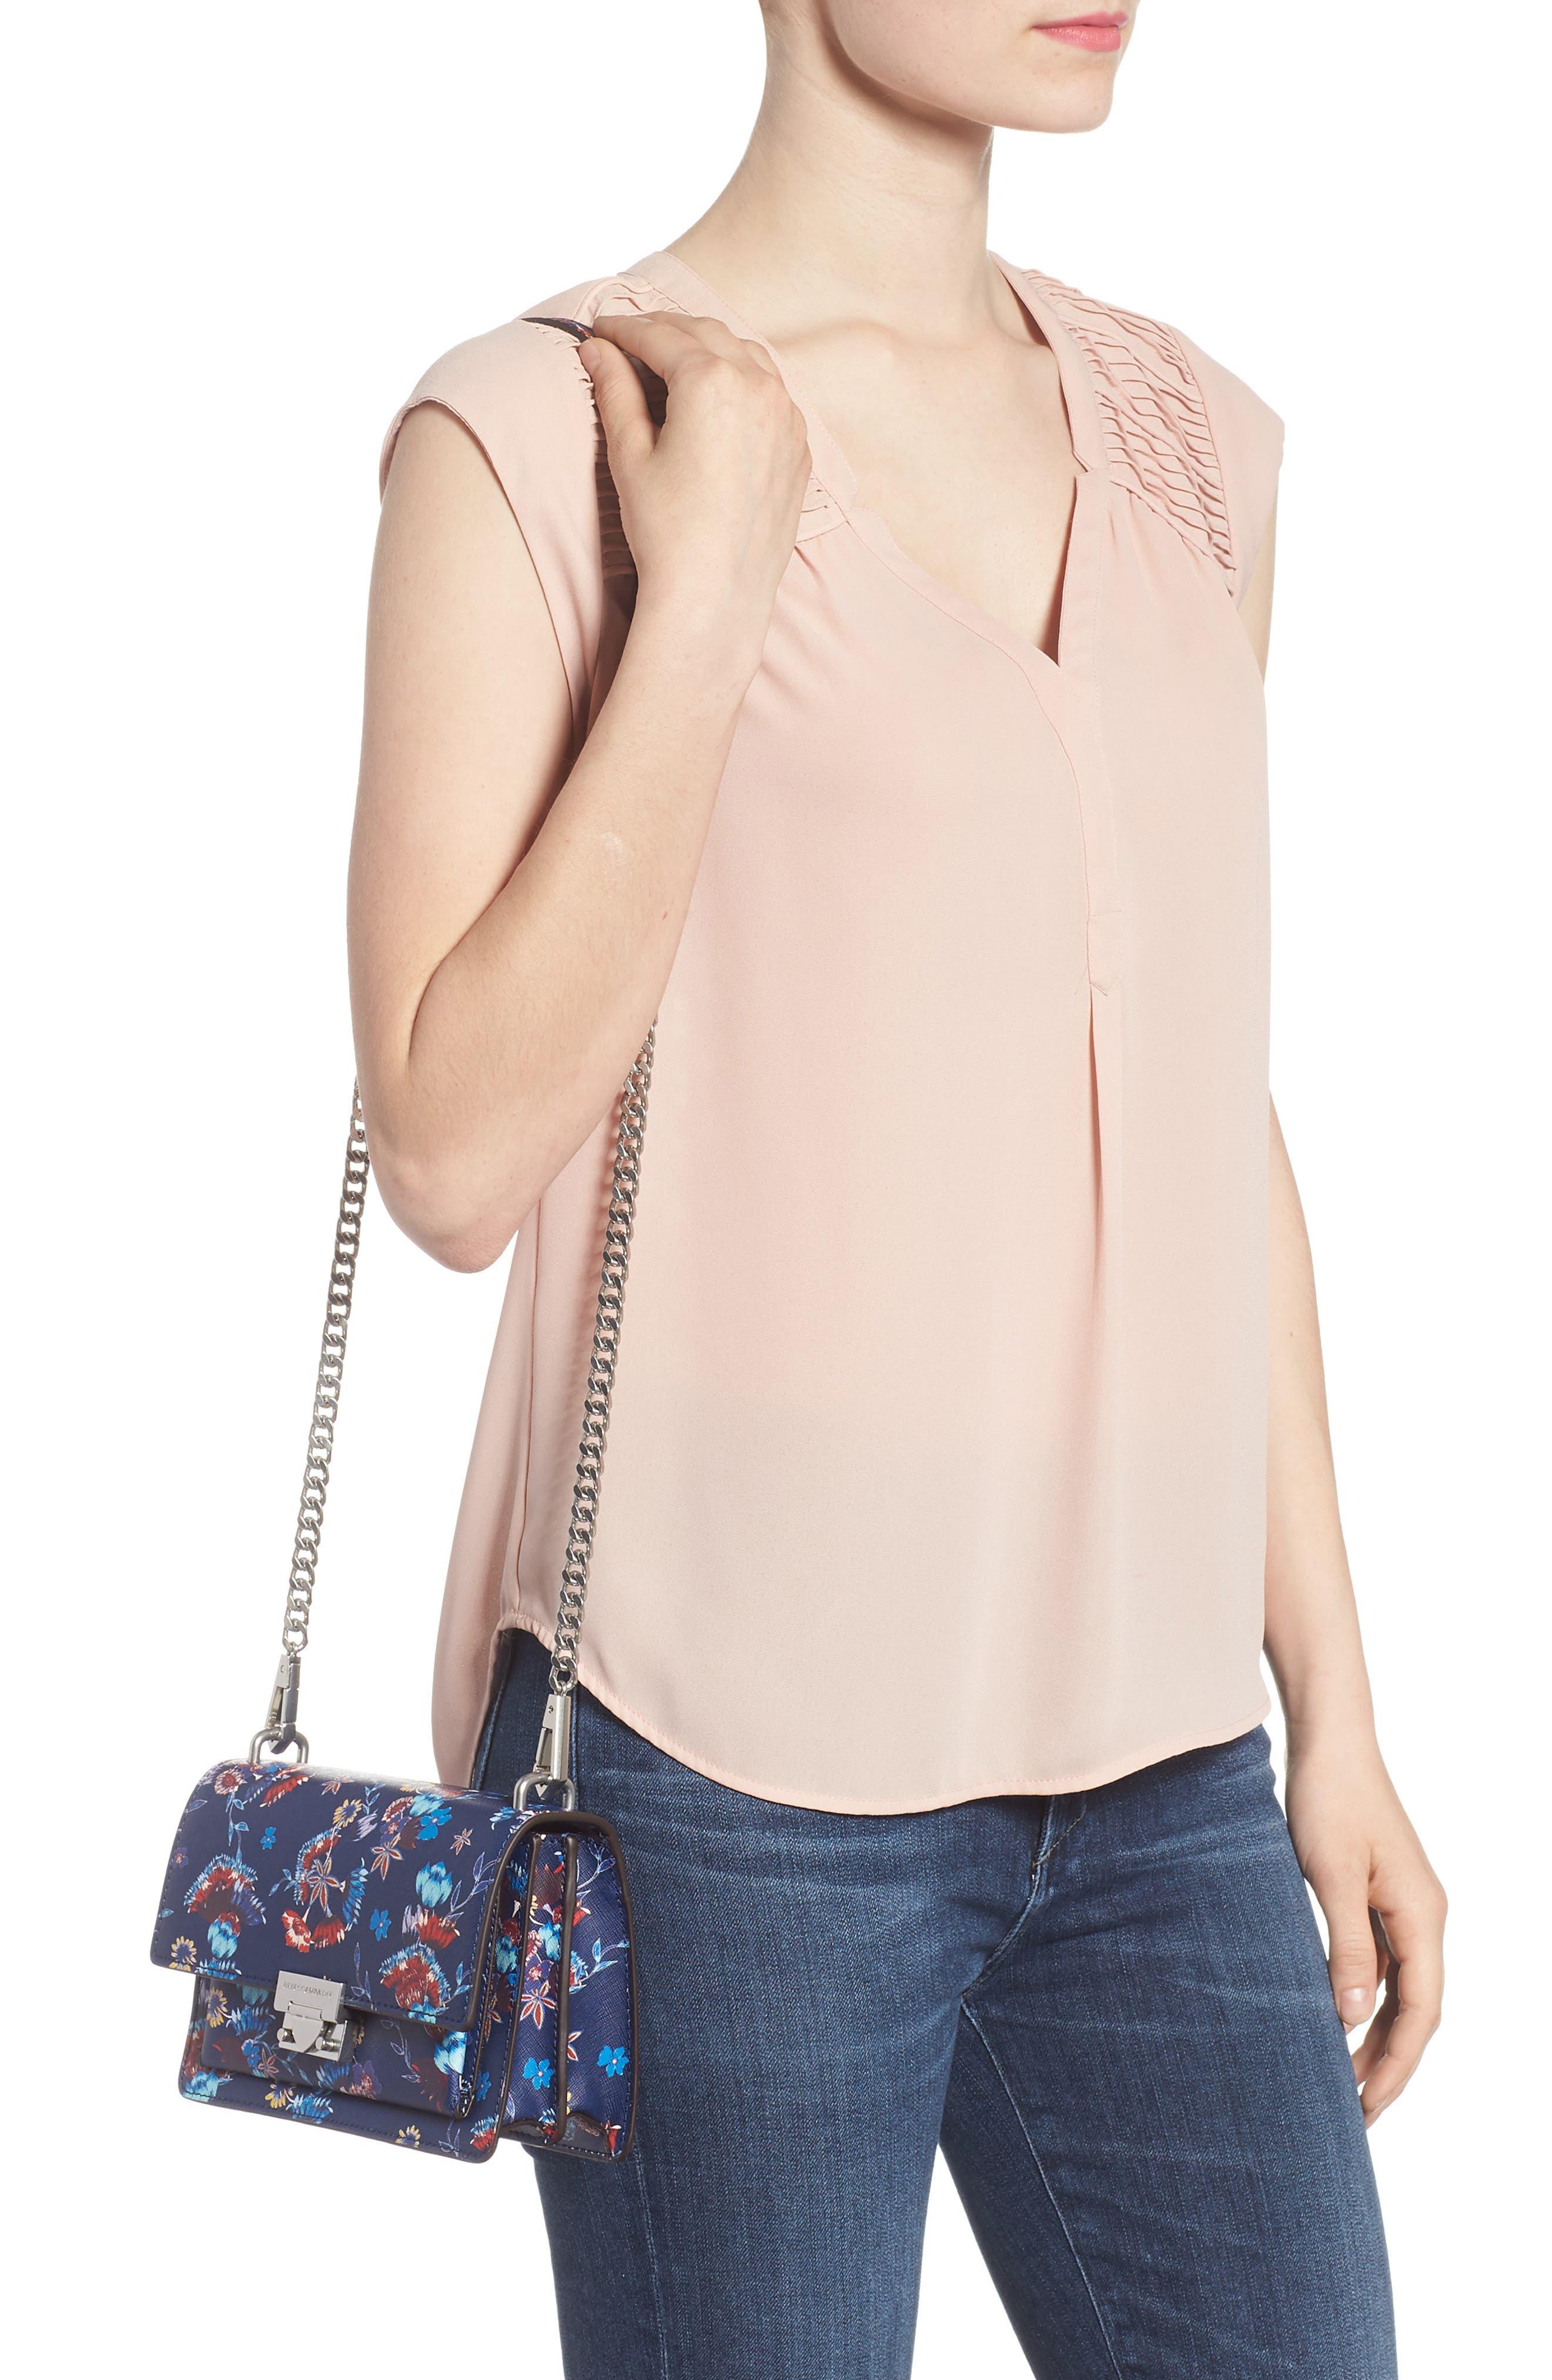 Small Christy Print Leather Shoulder Bag,                             Alternate thumbnail 2, color,                             Floral Blue